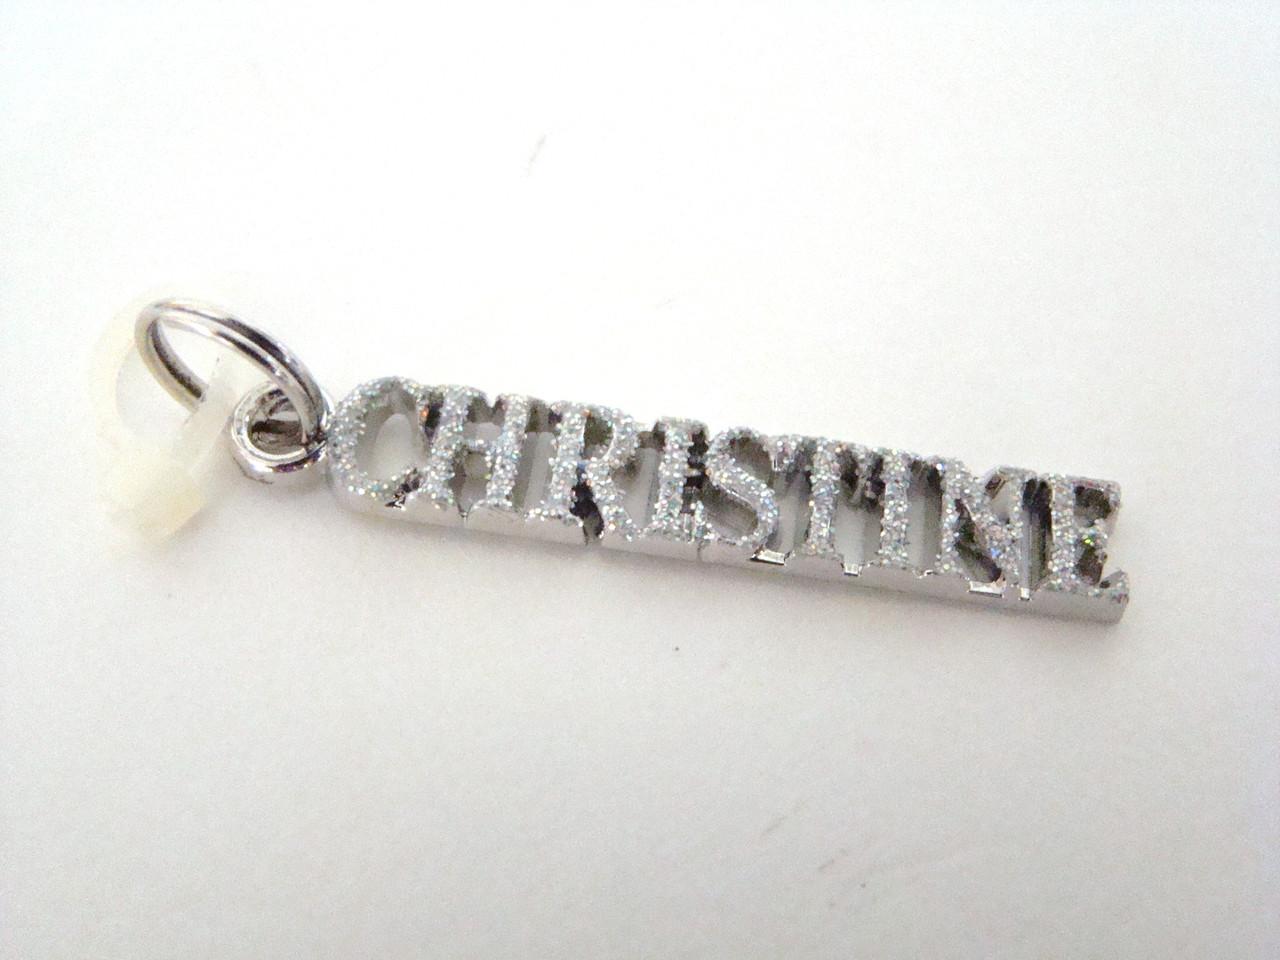 Silver glitter personalized name charm CHRISTINE (GG1059CHRISTINE)